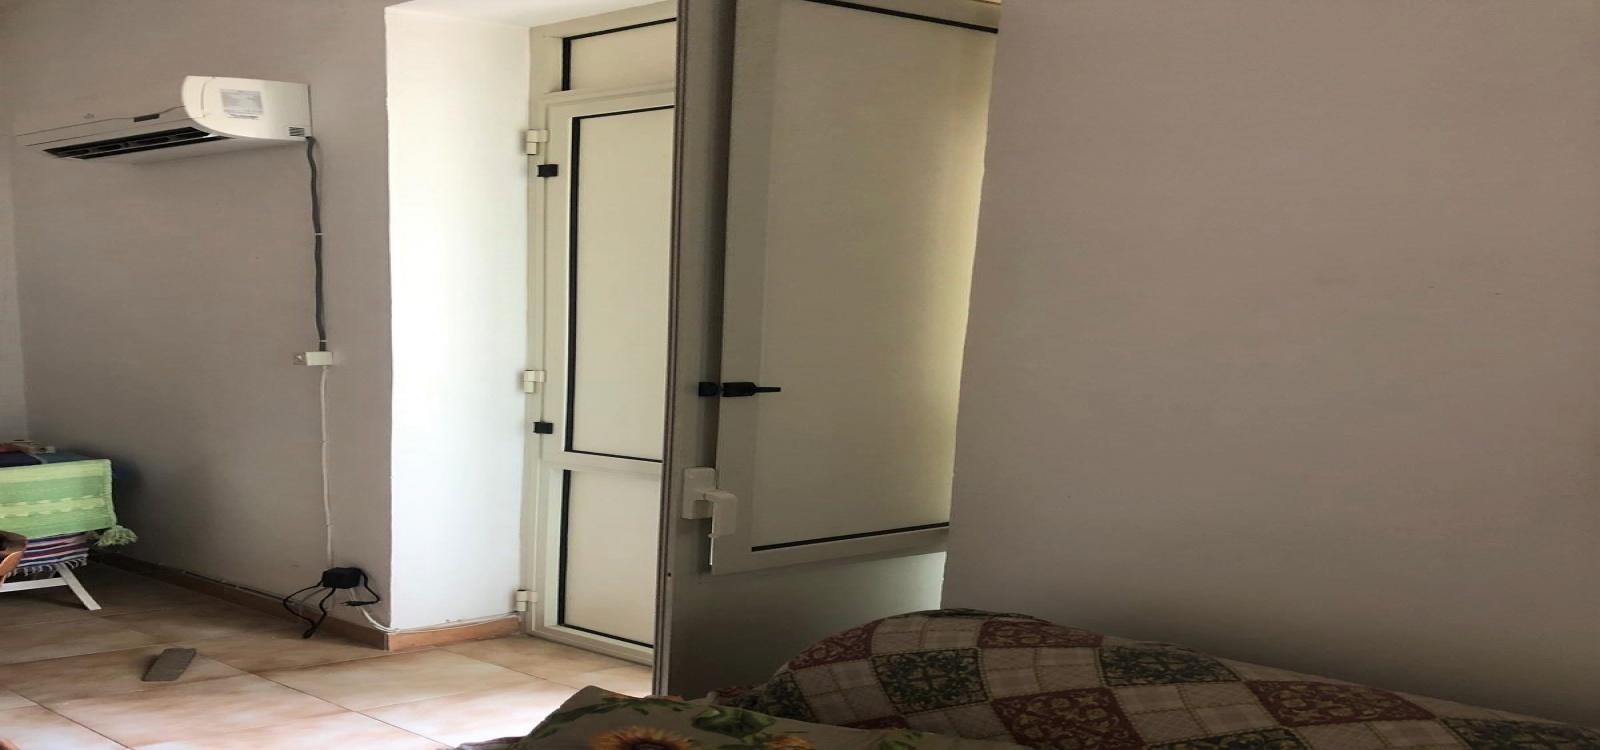 Borgata,siracusa,SIRACUSA,96100,Appartamento,Borgata,siracusa,2315